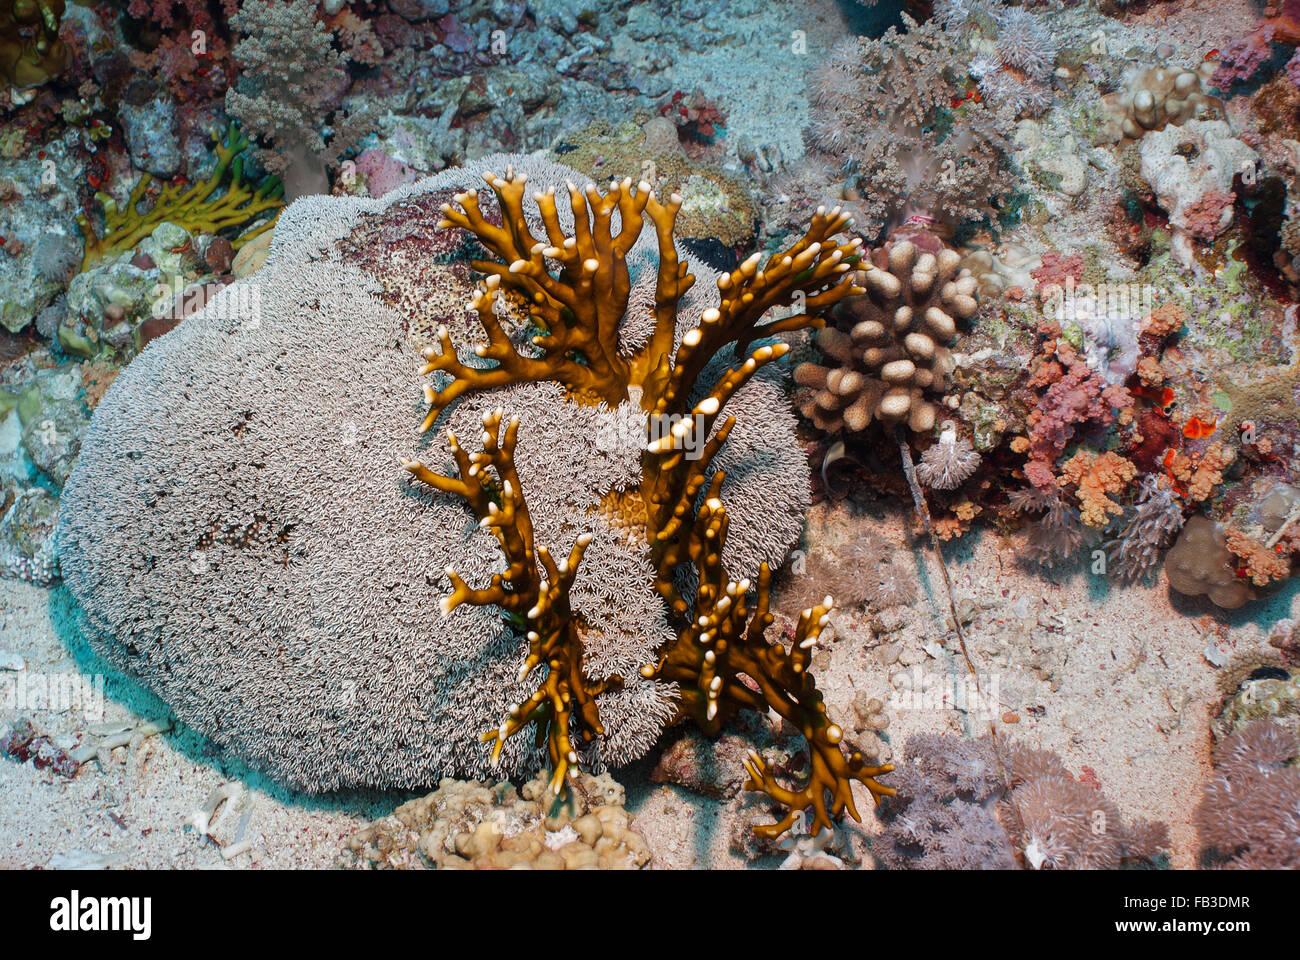 Organ Pipe coral , Tubipora musica, Tubiporidae, Sharm el Sheikh, Mar Rojo, Egipto Imagen De Stock